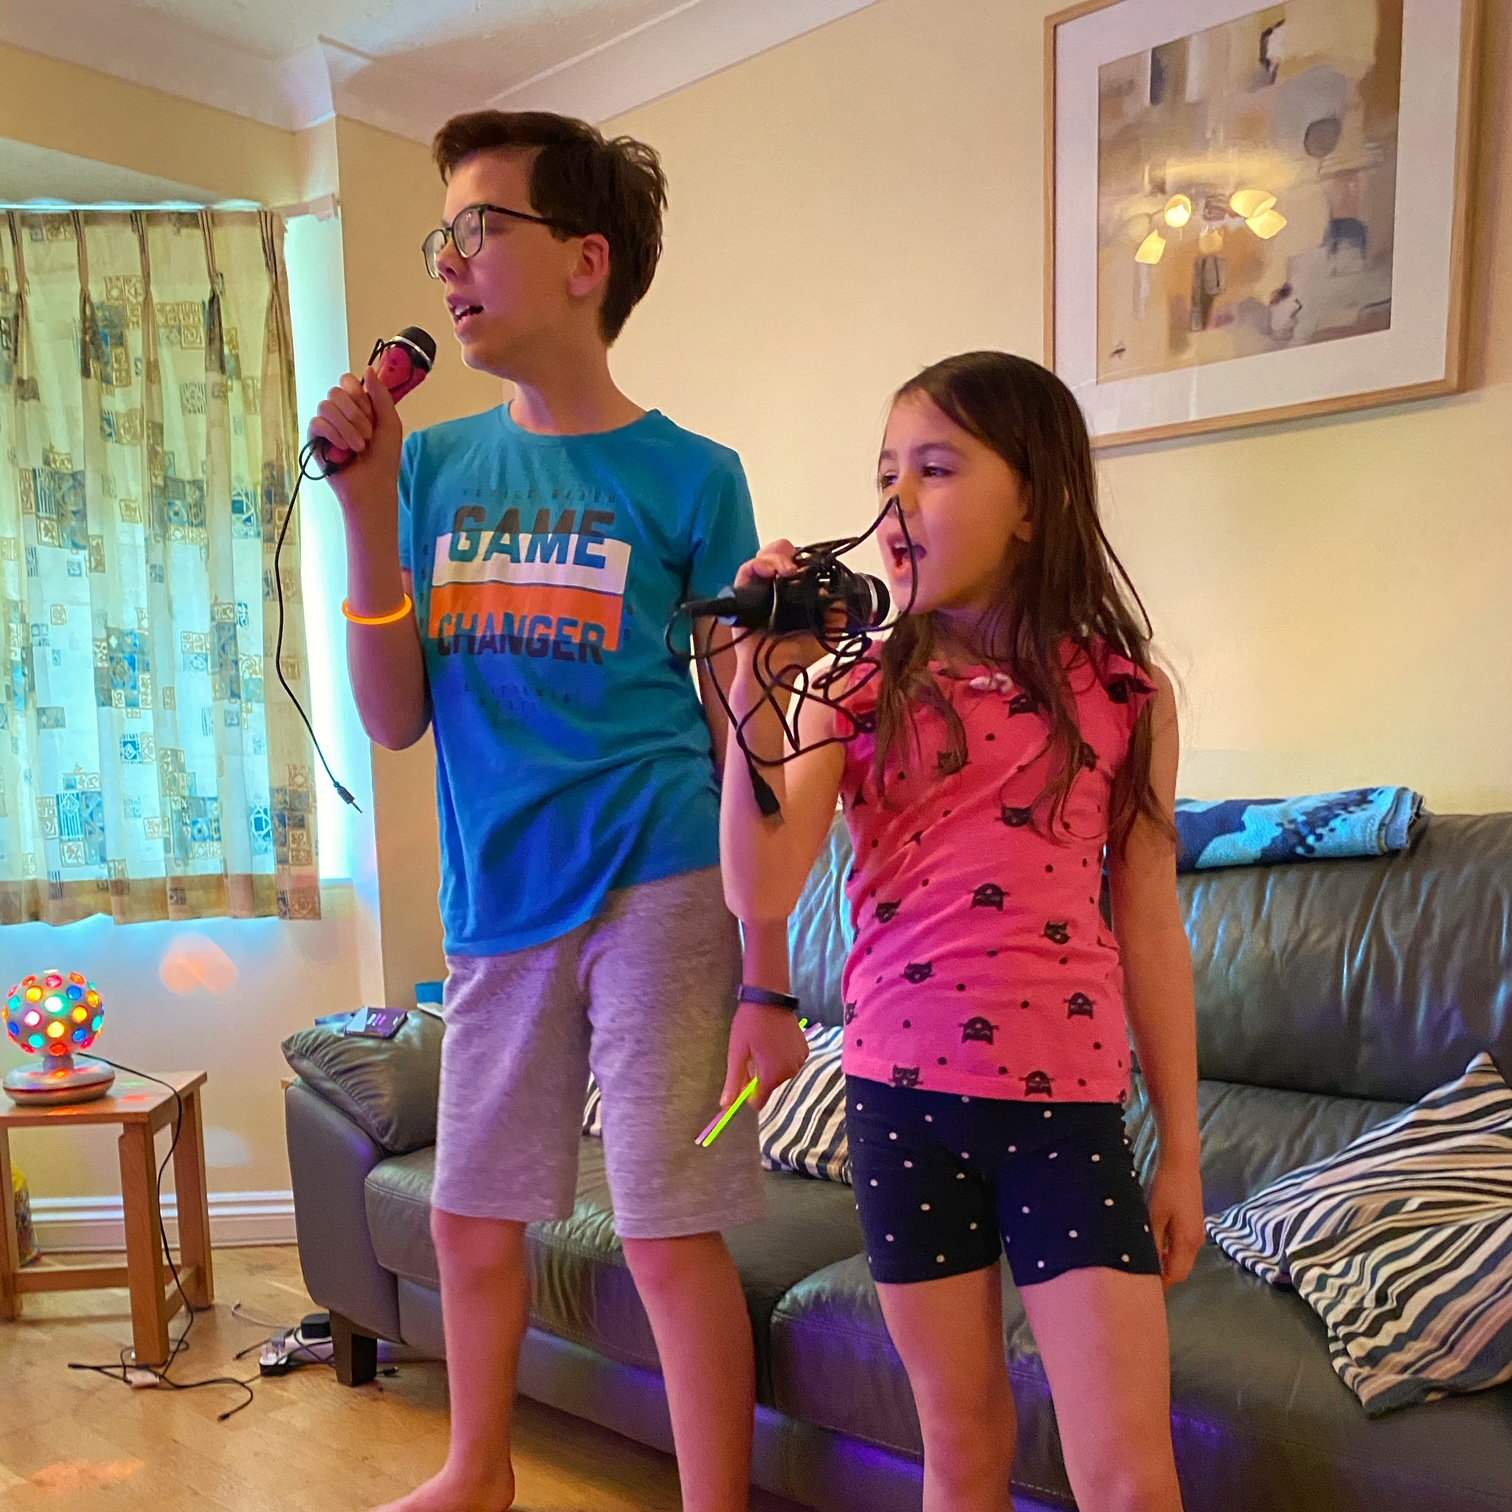 A boy and a girl singing karaoke